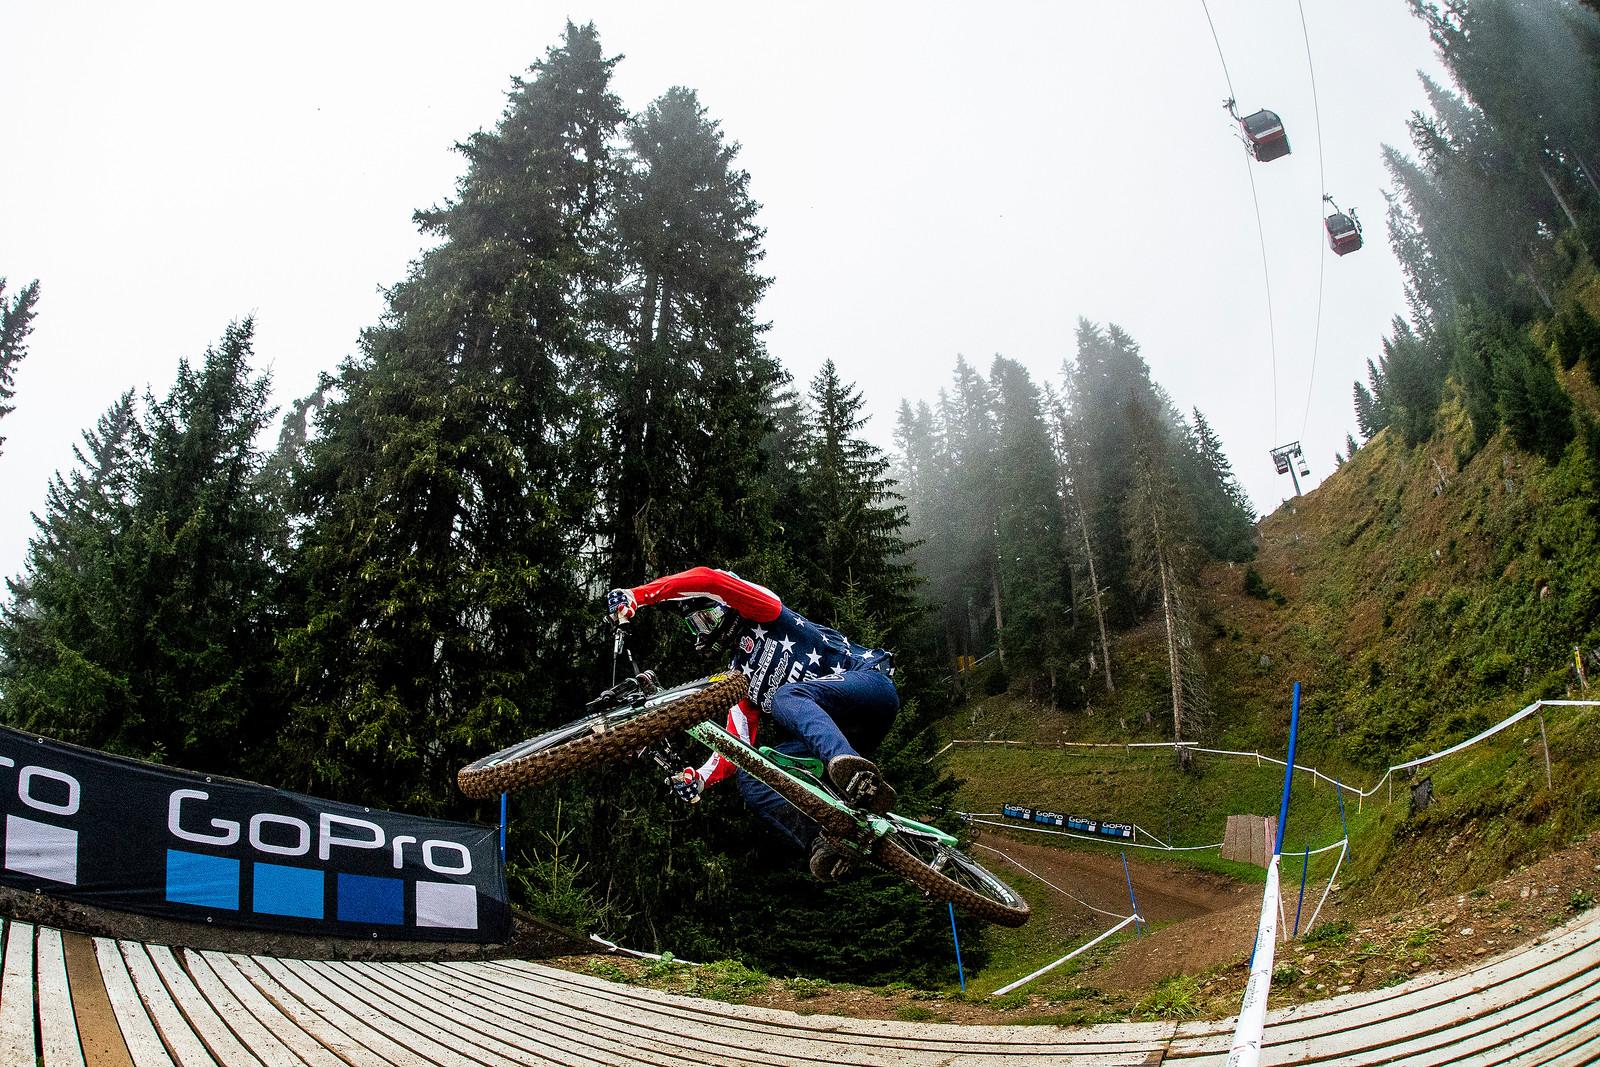 Charlie Harrison - WORLD CHAMPS WHIPFEST - Mountain Biking Pictures - Vital MTB